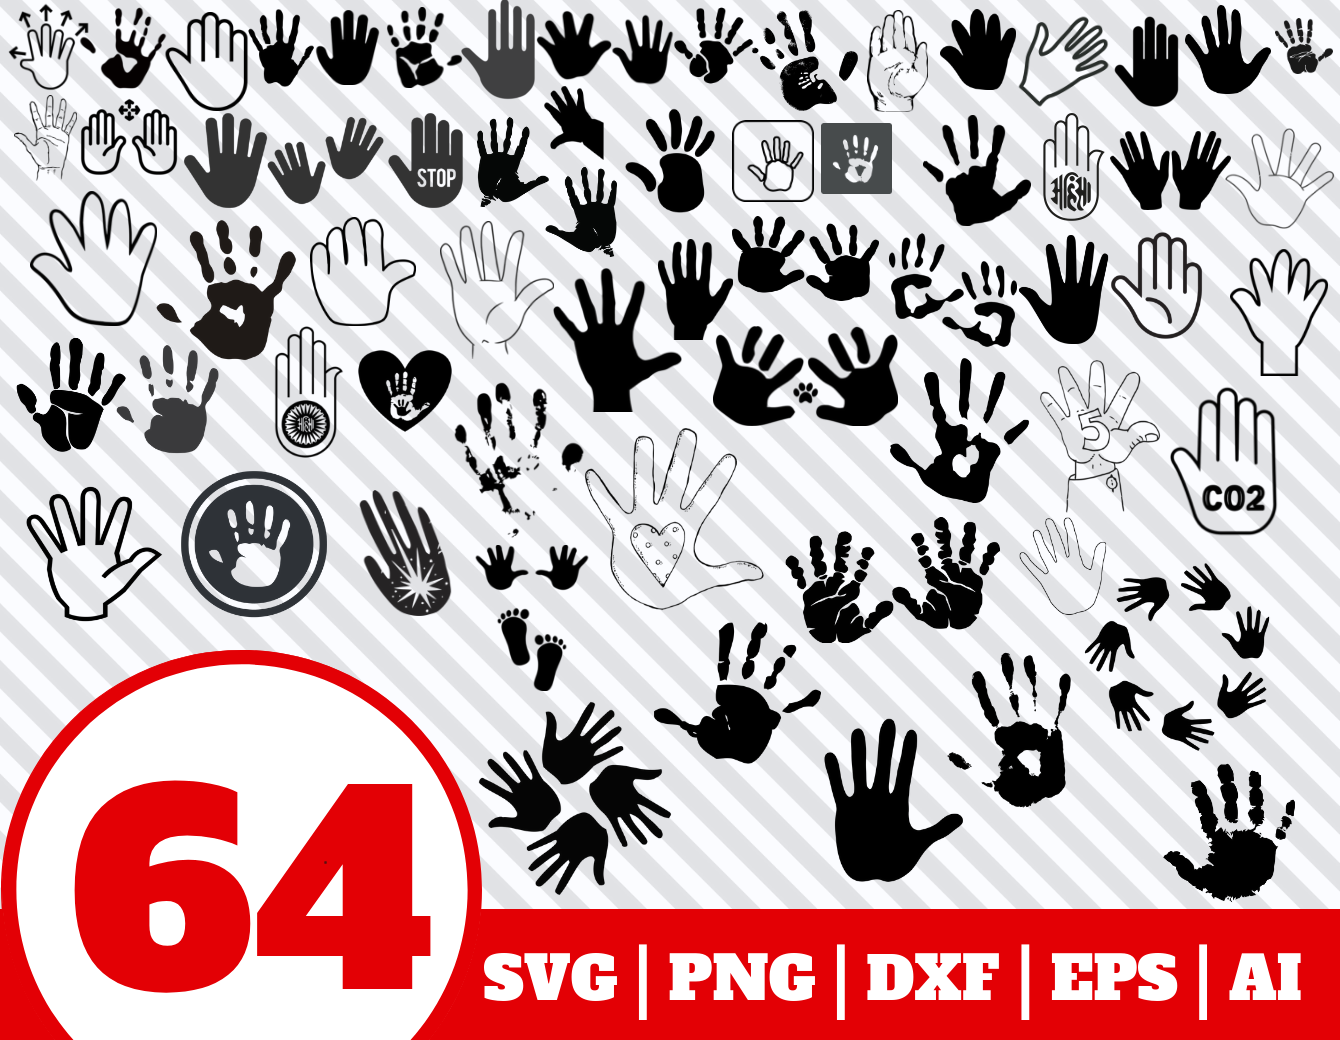 64 Hand Print Svg Bundle Hand Print Clipart Hand Print Vector